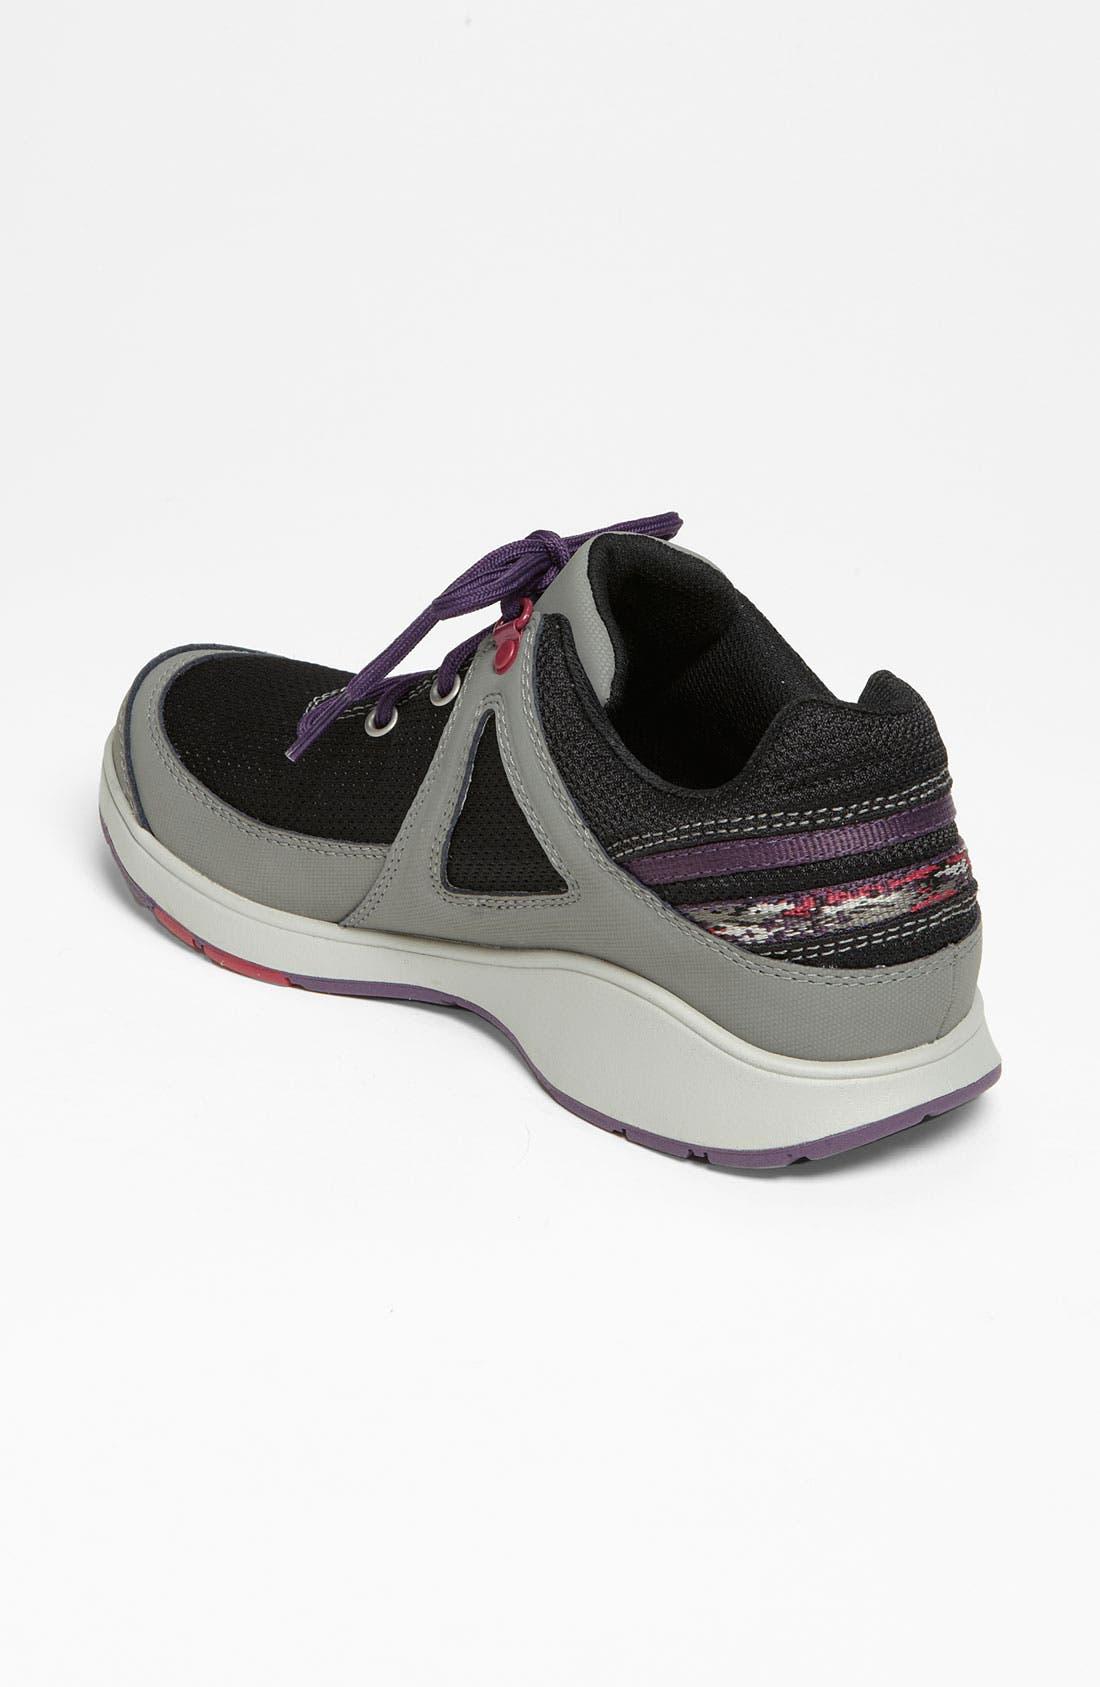 Alternate Image 2  - Chaco 'Vika' Sneaker (Women)